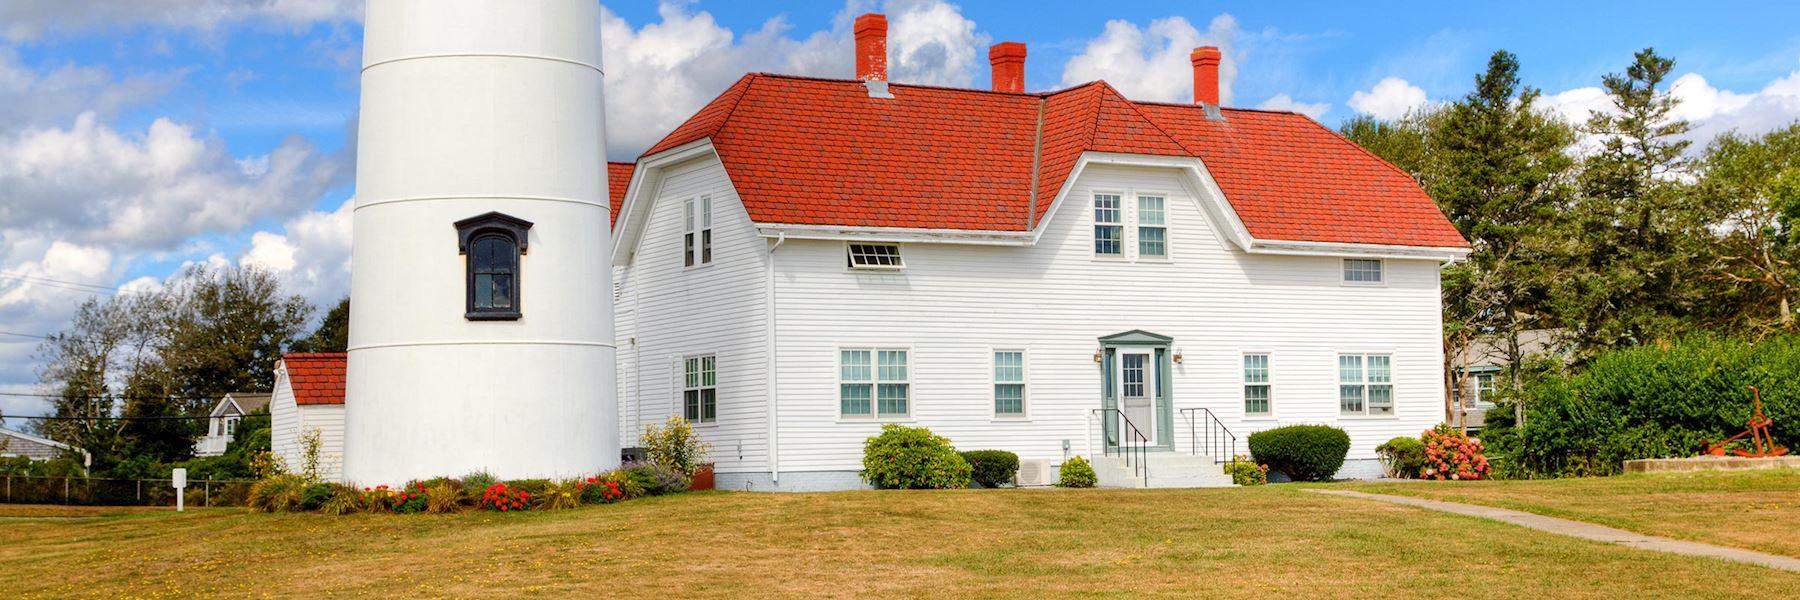 Visit Chatham, New England